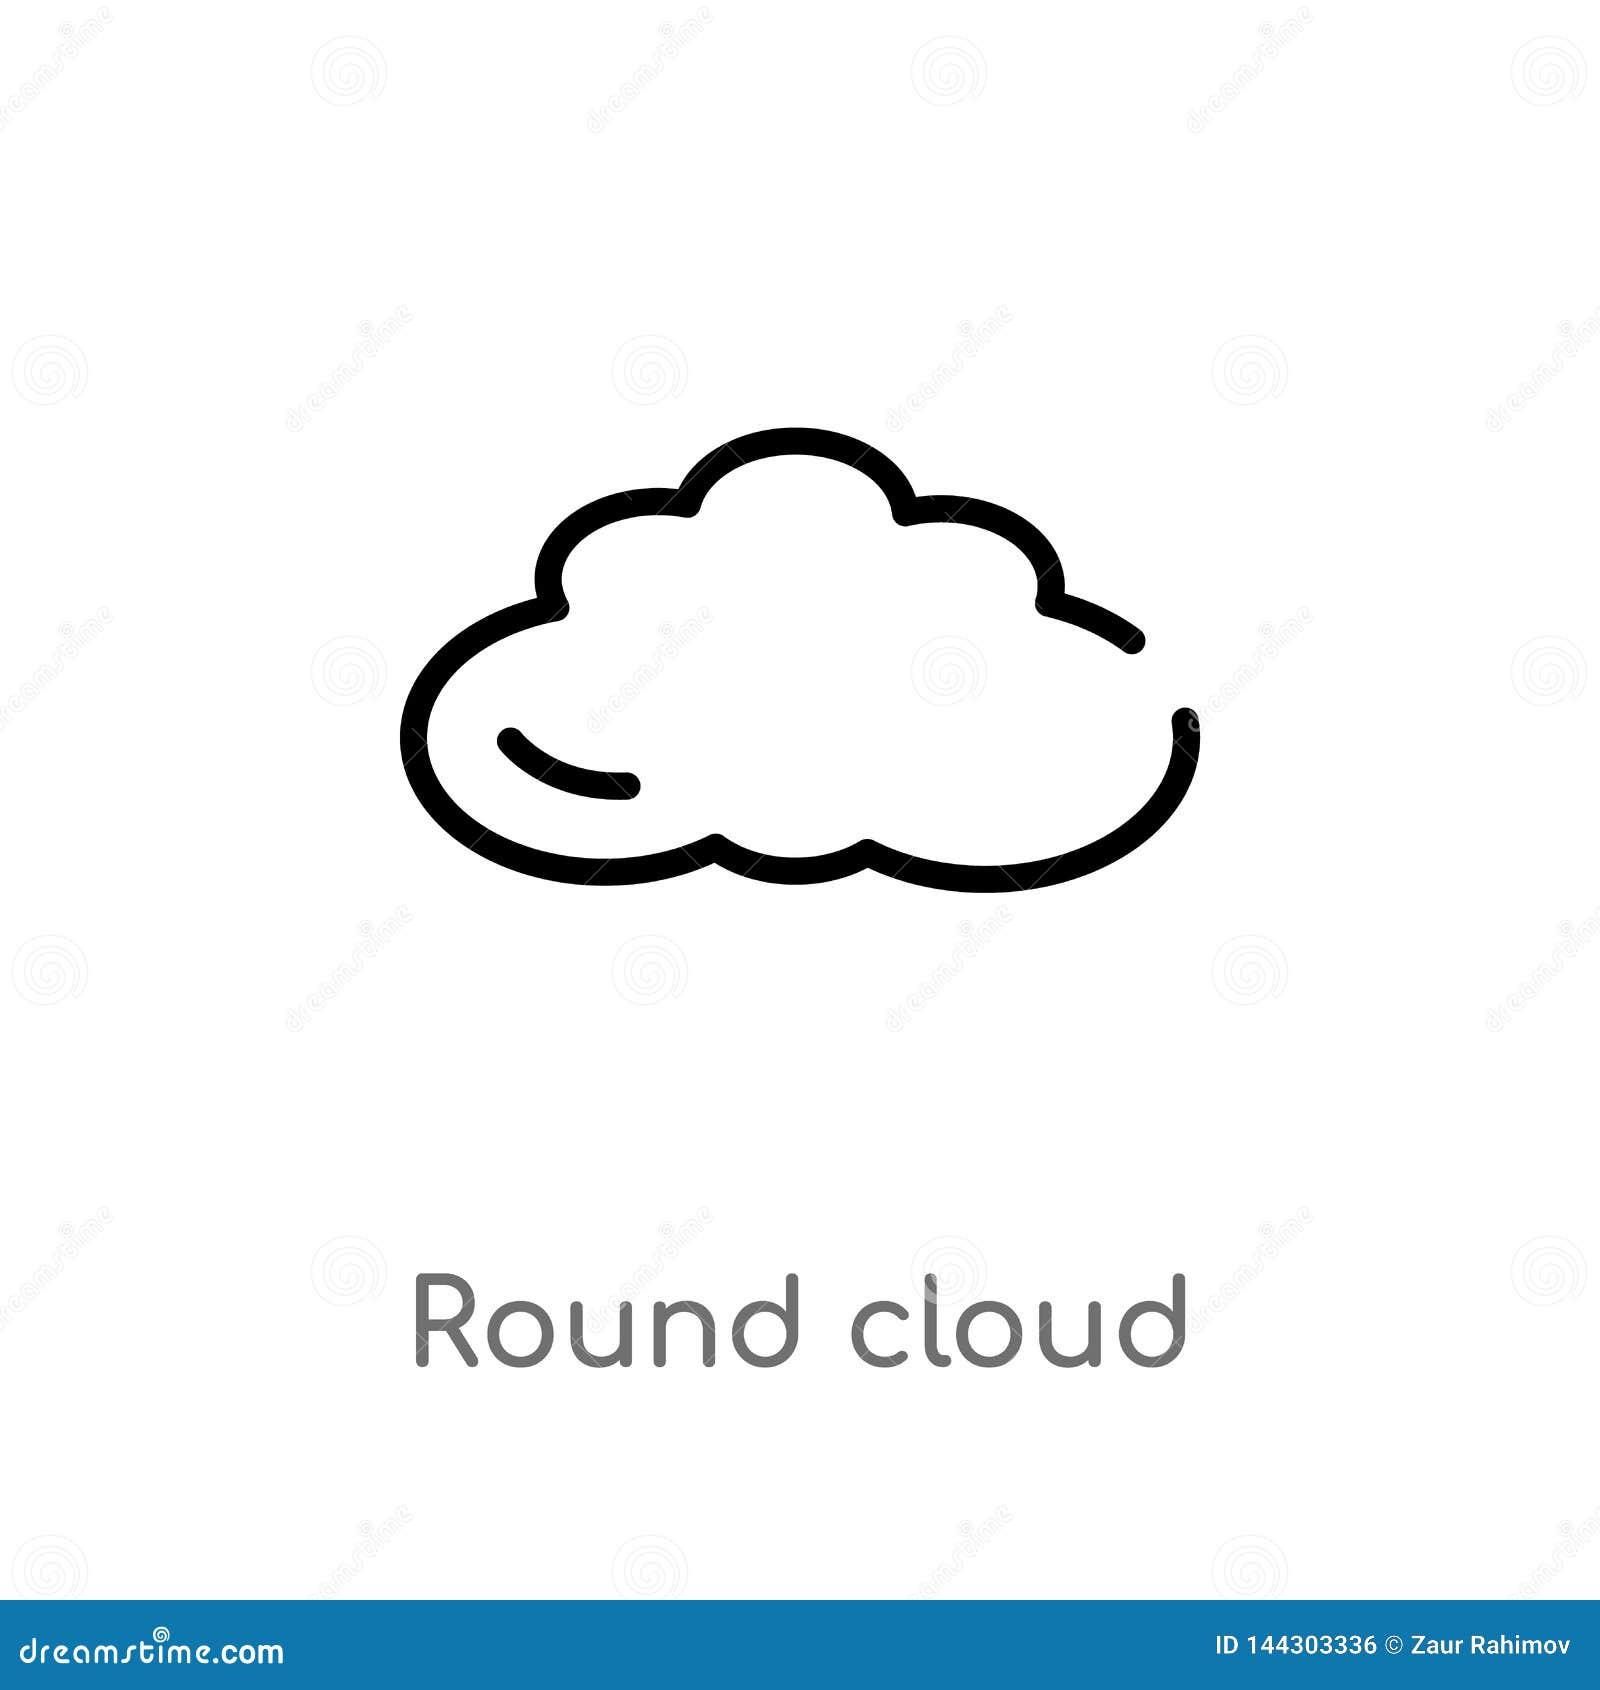 Icono redondo del vector de la nube del esquema l?nea simple negra aislada ejemplo del elemento del concepto del tiempo Movimient